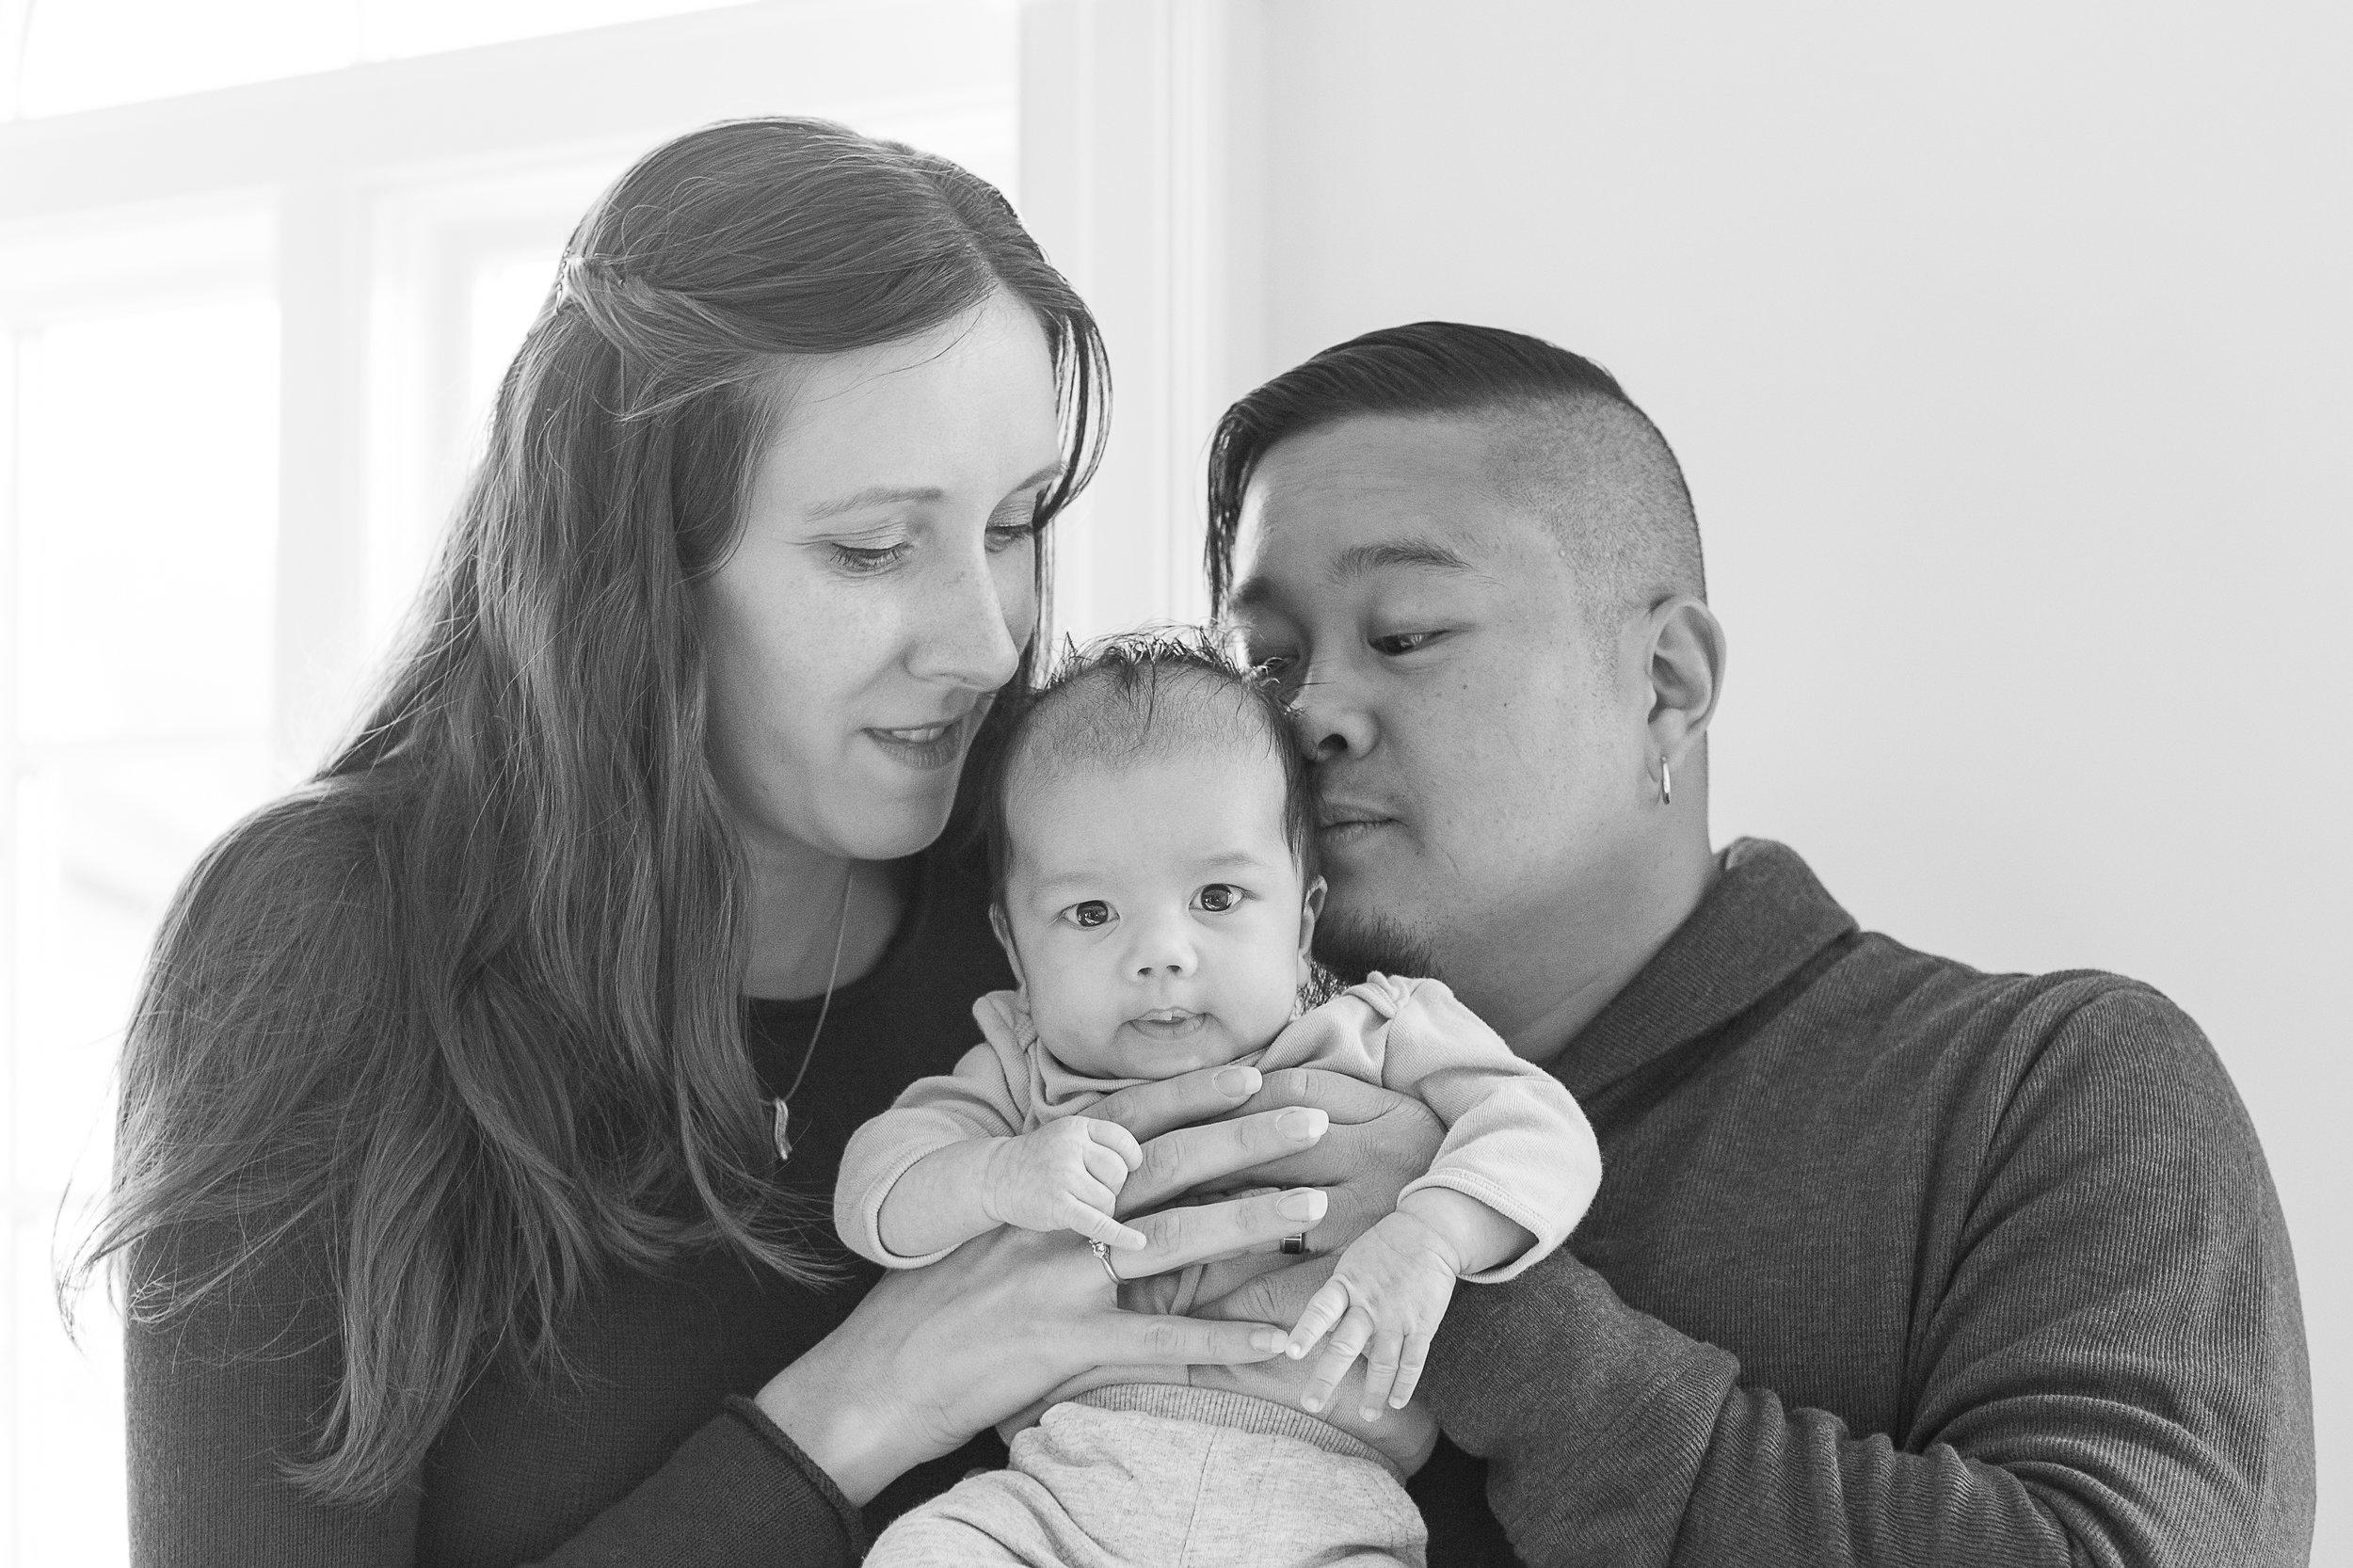 09-JEB-Multi-Family-Portrait-Kim-Pham-Clark-Photography.jpg